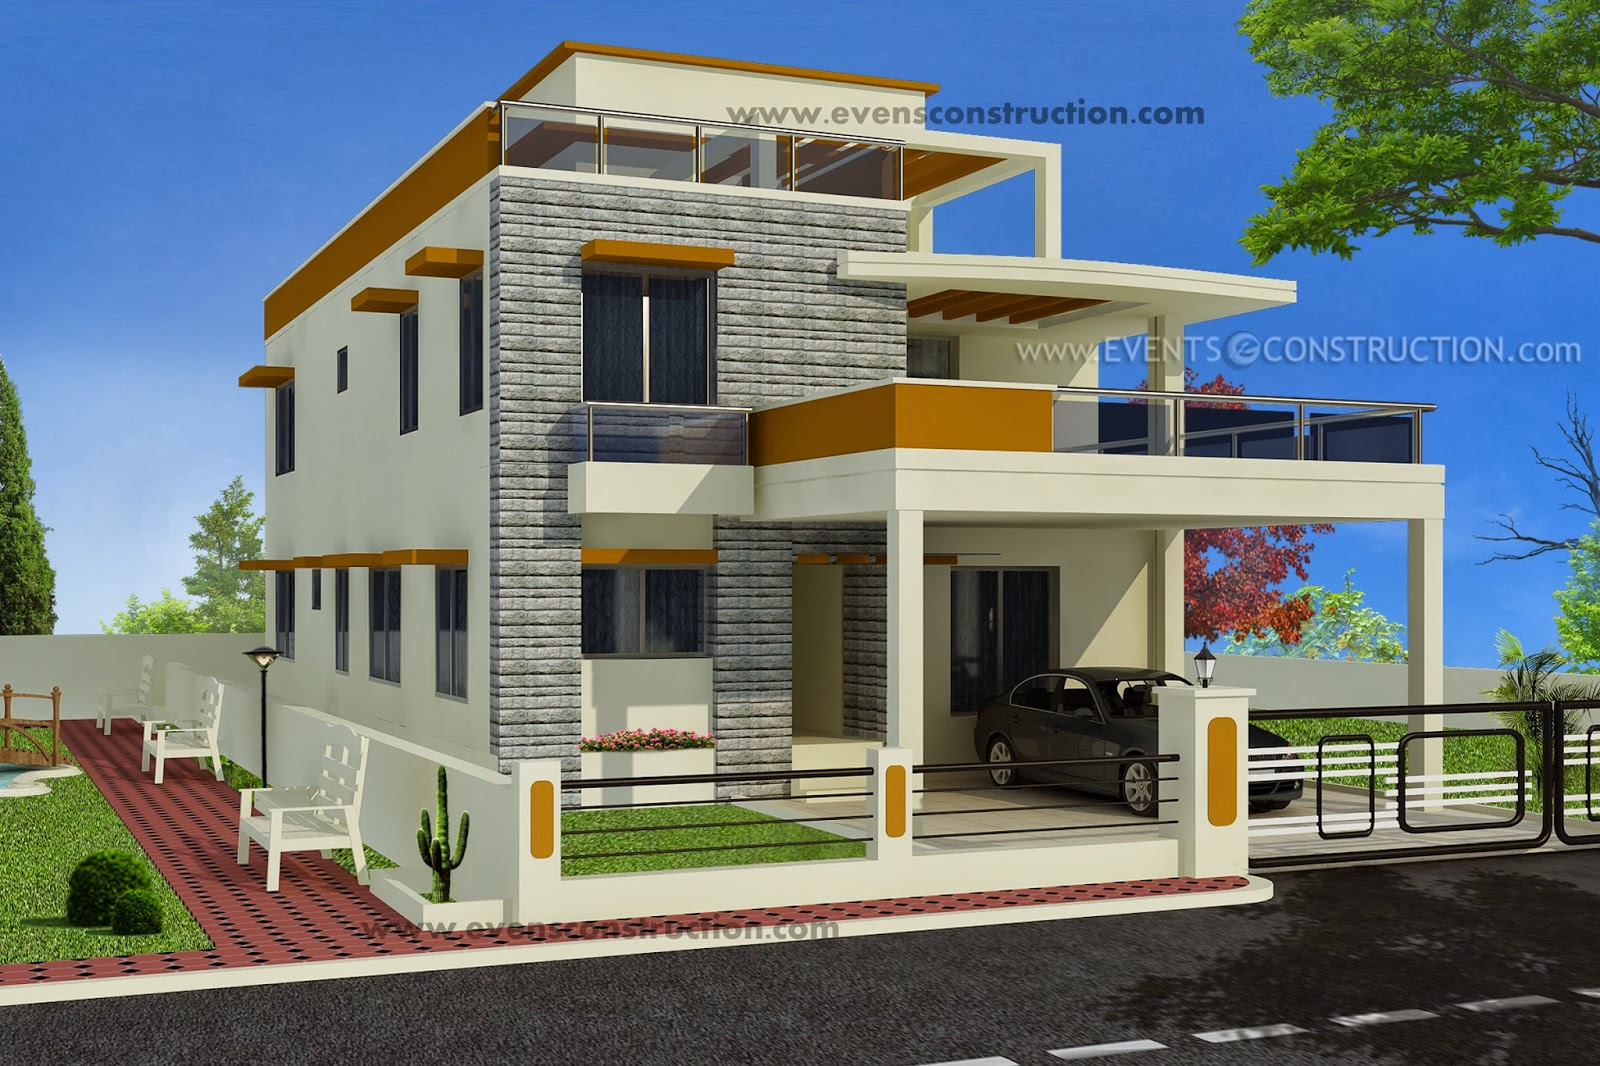 Evens Construction Pvt Ltd Contemporary Flat Roof Villa